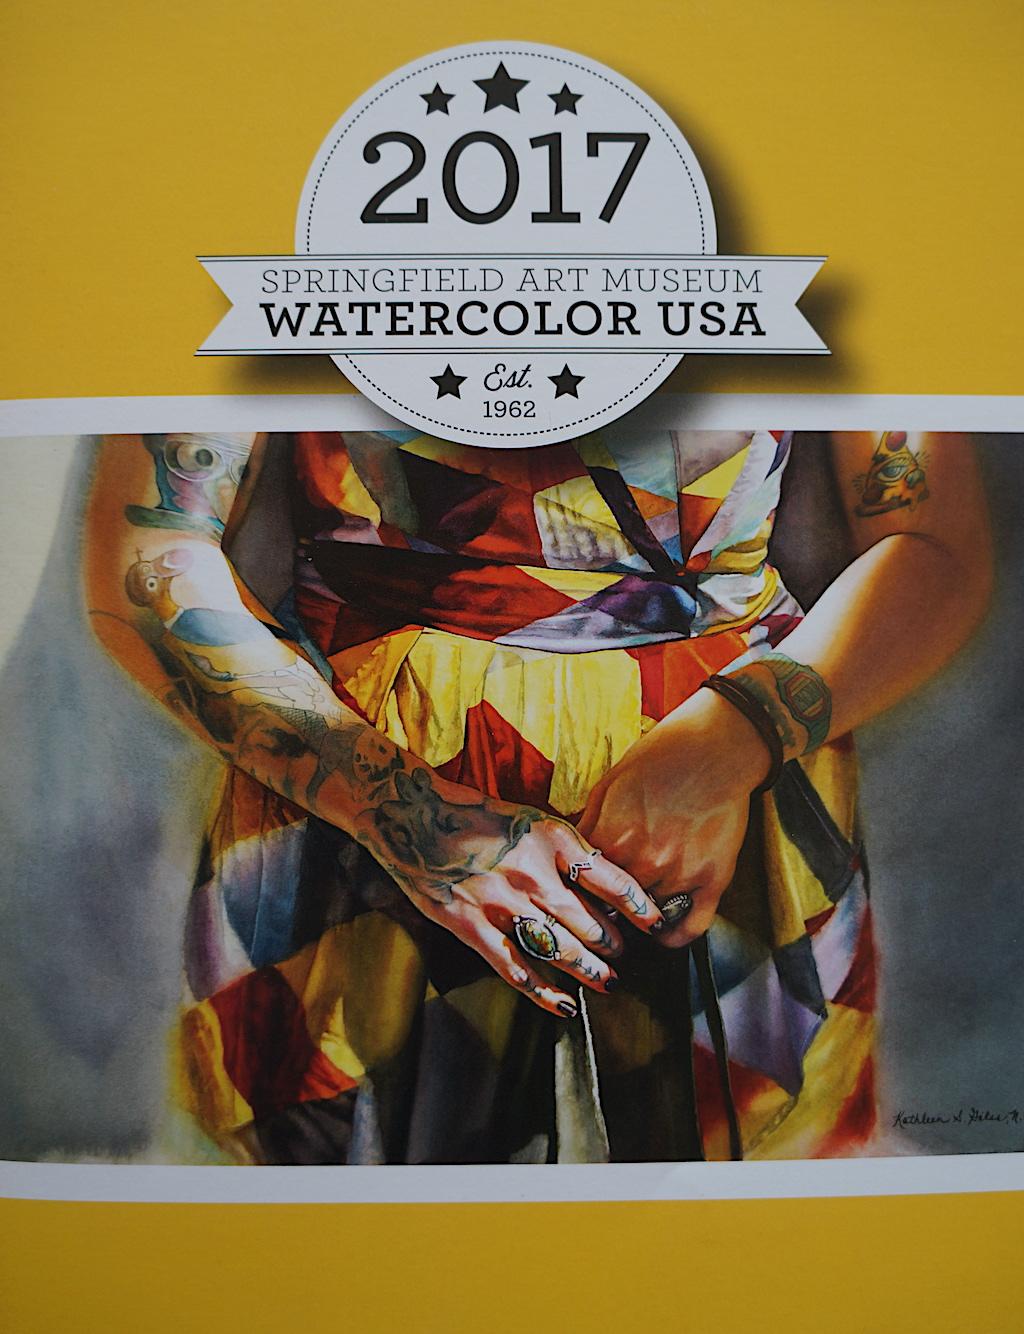 Watercolor USA 2017